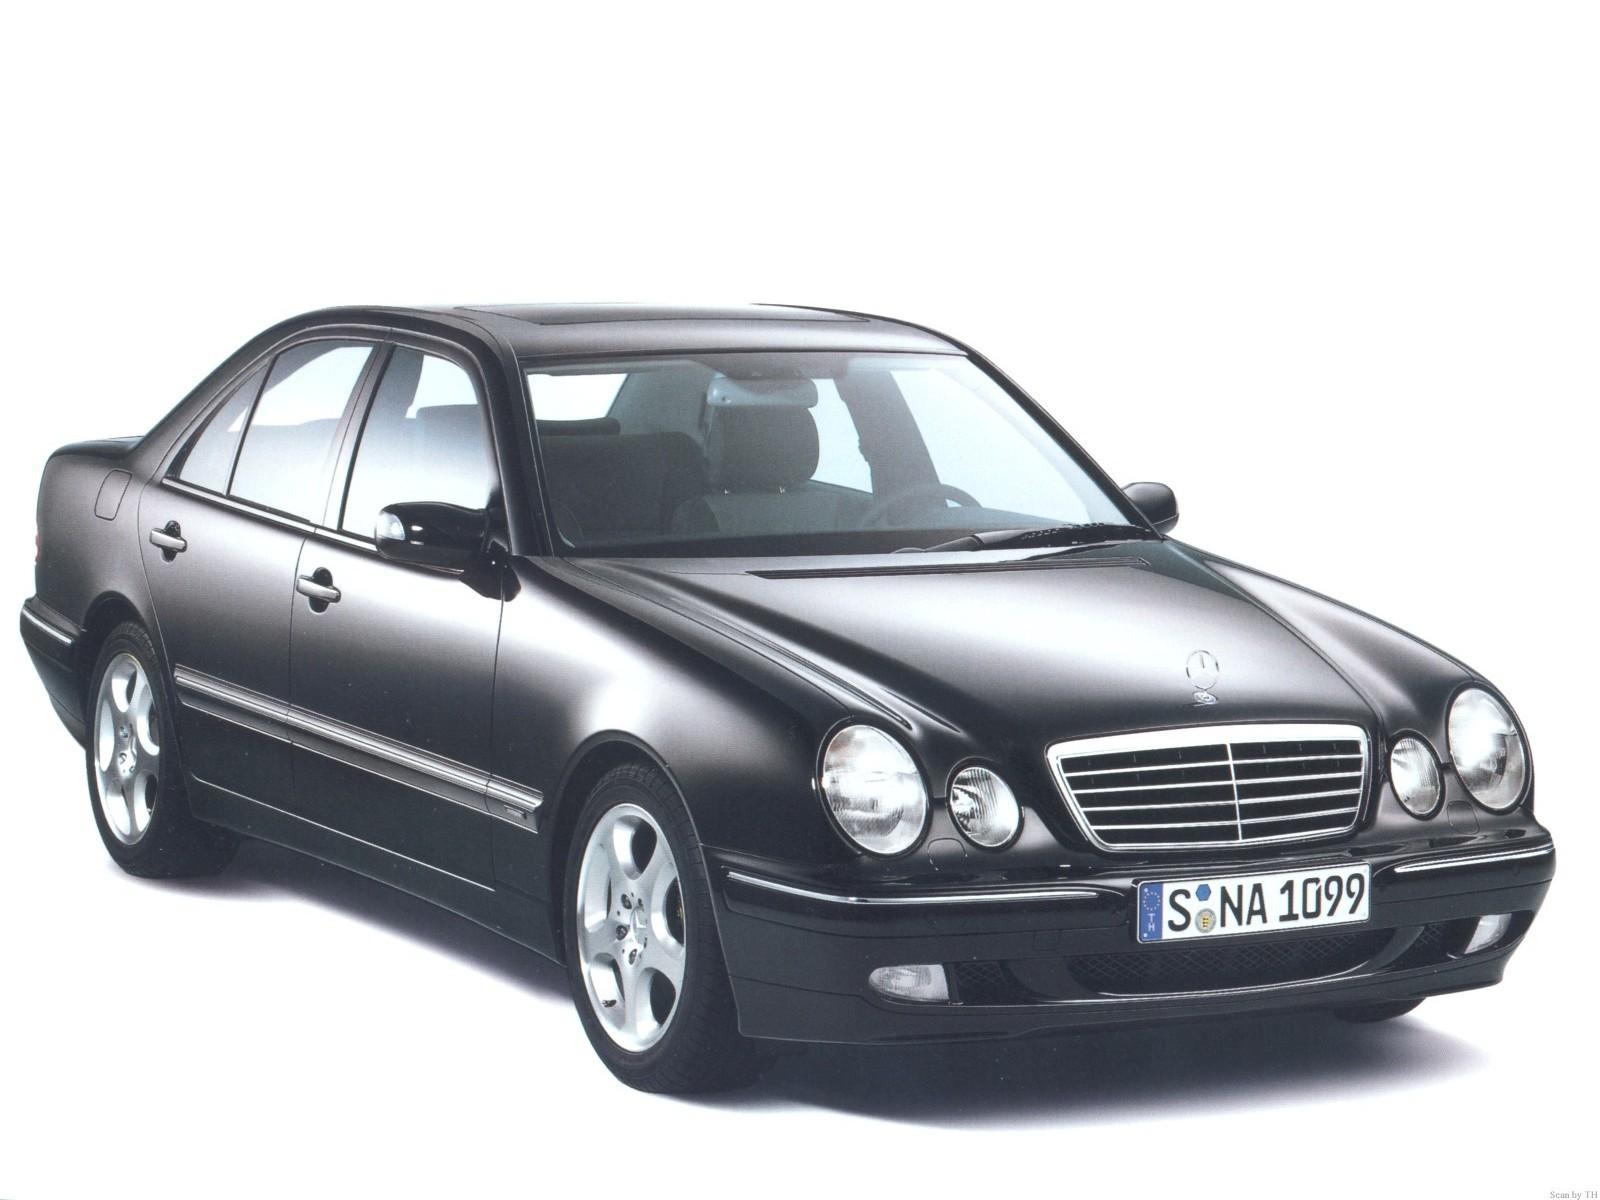 http://www.thhe.dk/biler/Mercedes_E-Class-1600.jpg